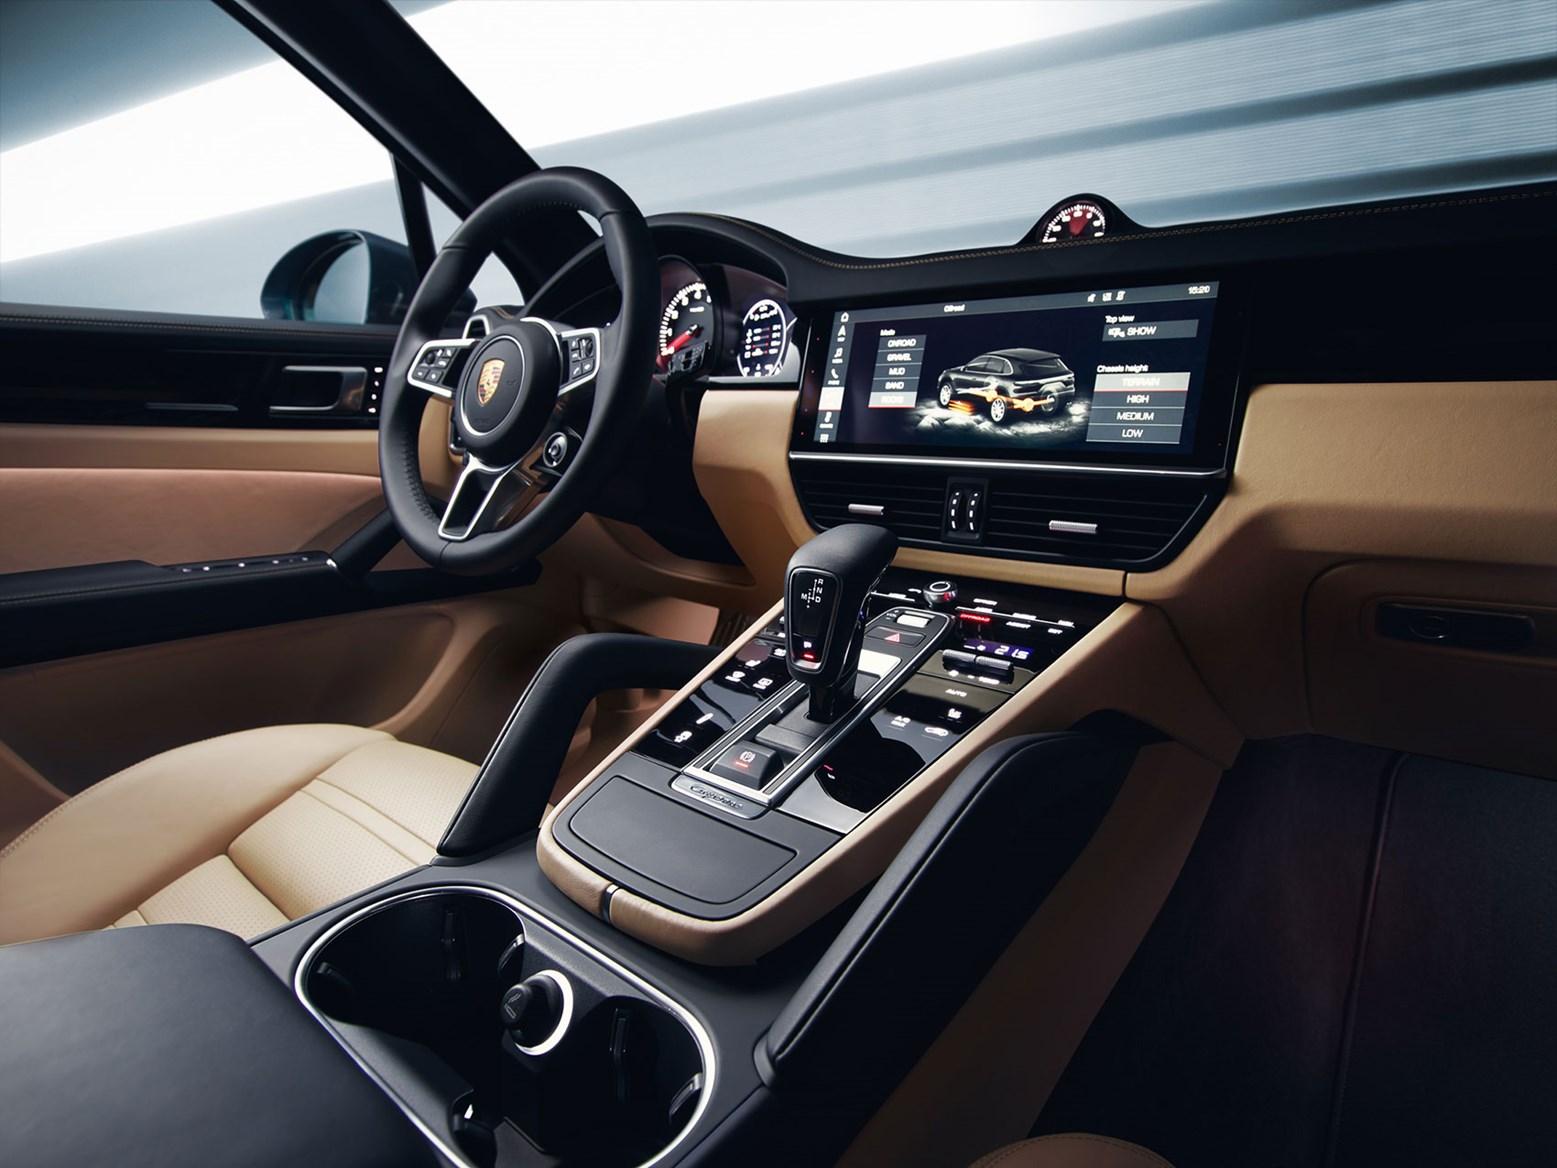 New 2018 Porsche Cayenne Pics Performance Specs And Price Car Magazine